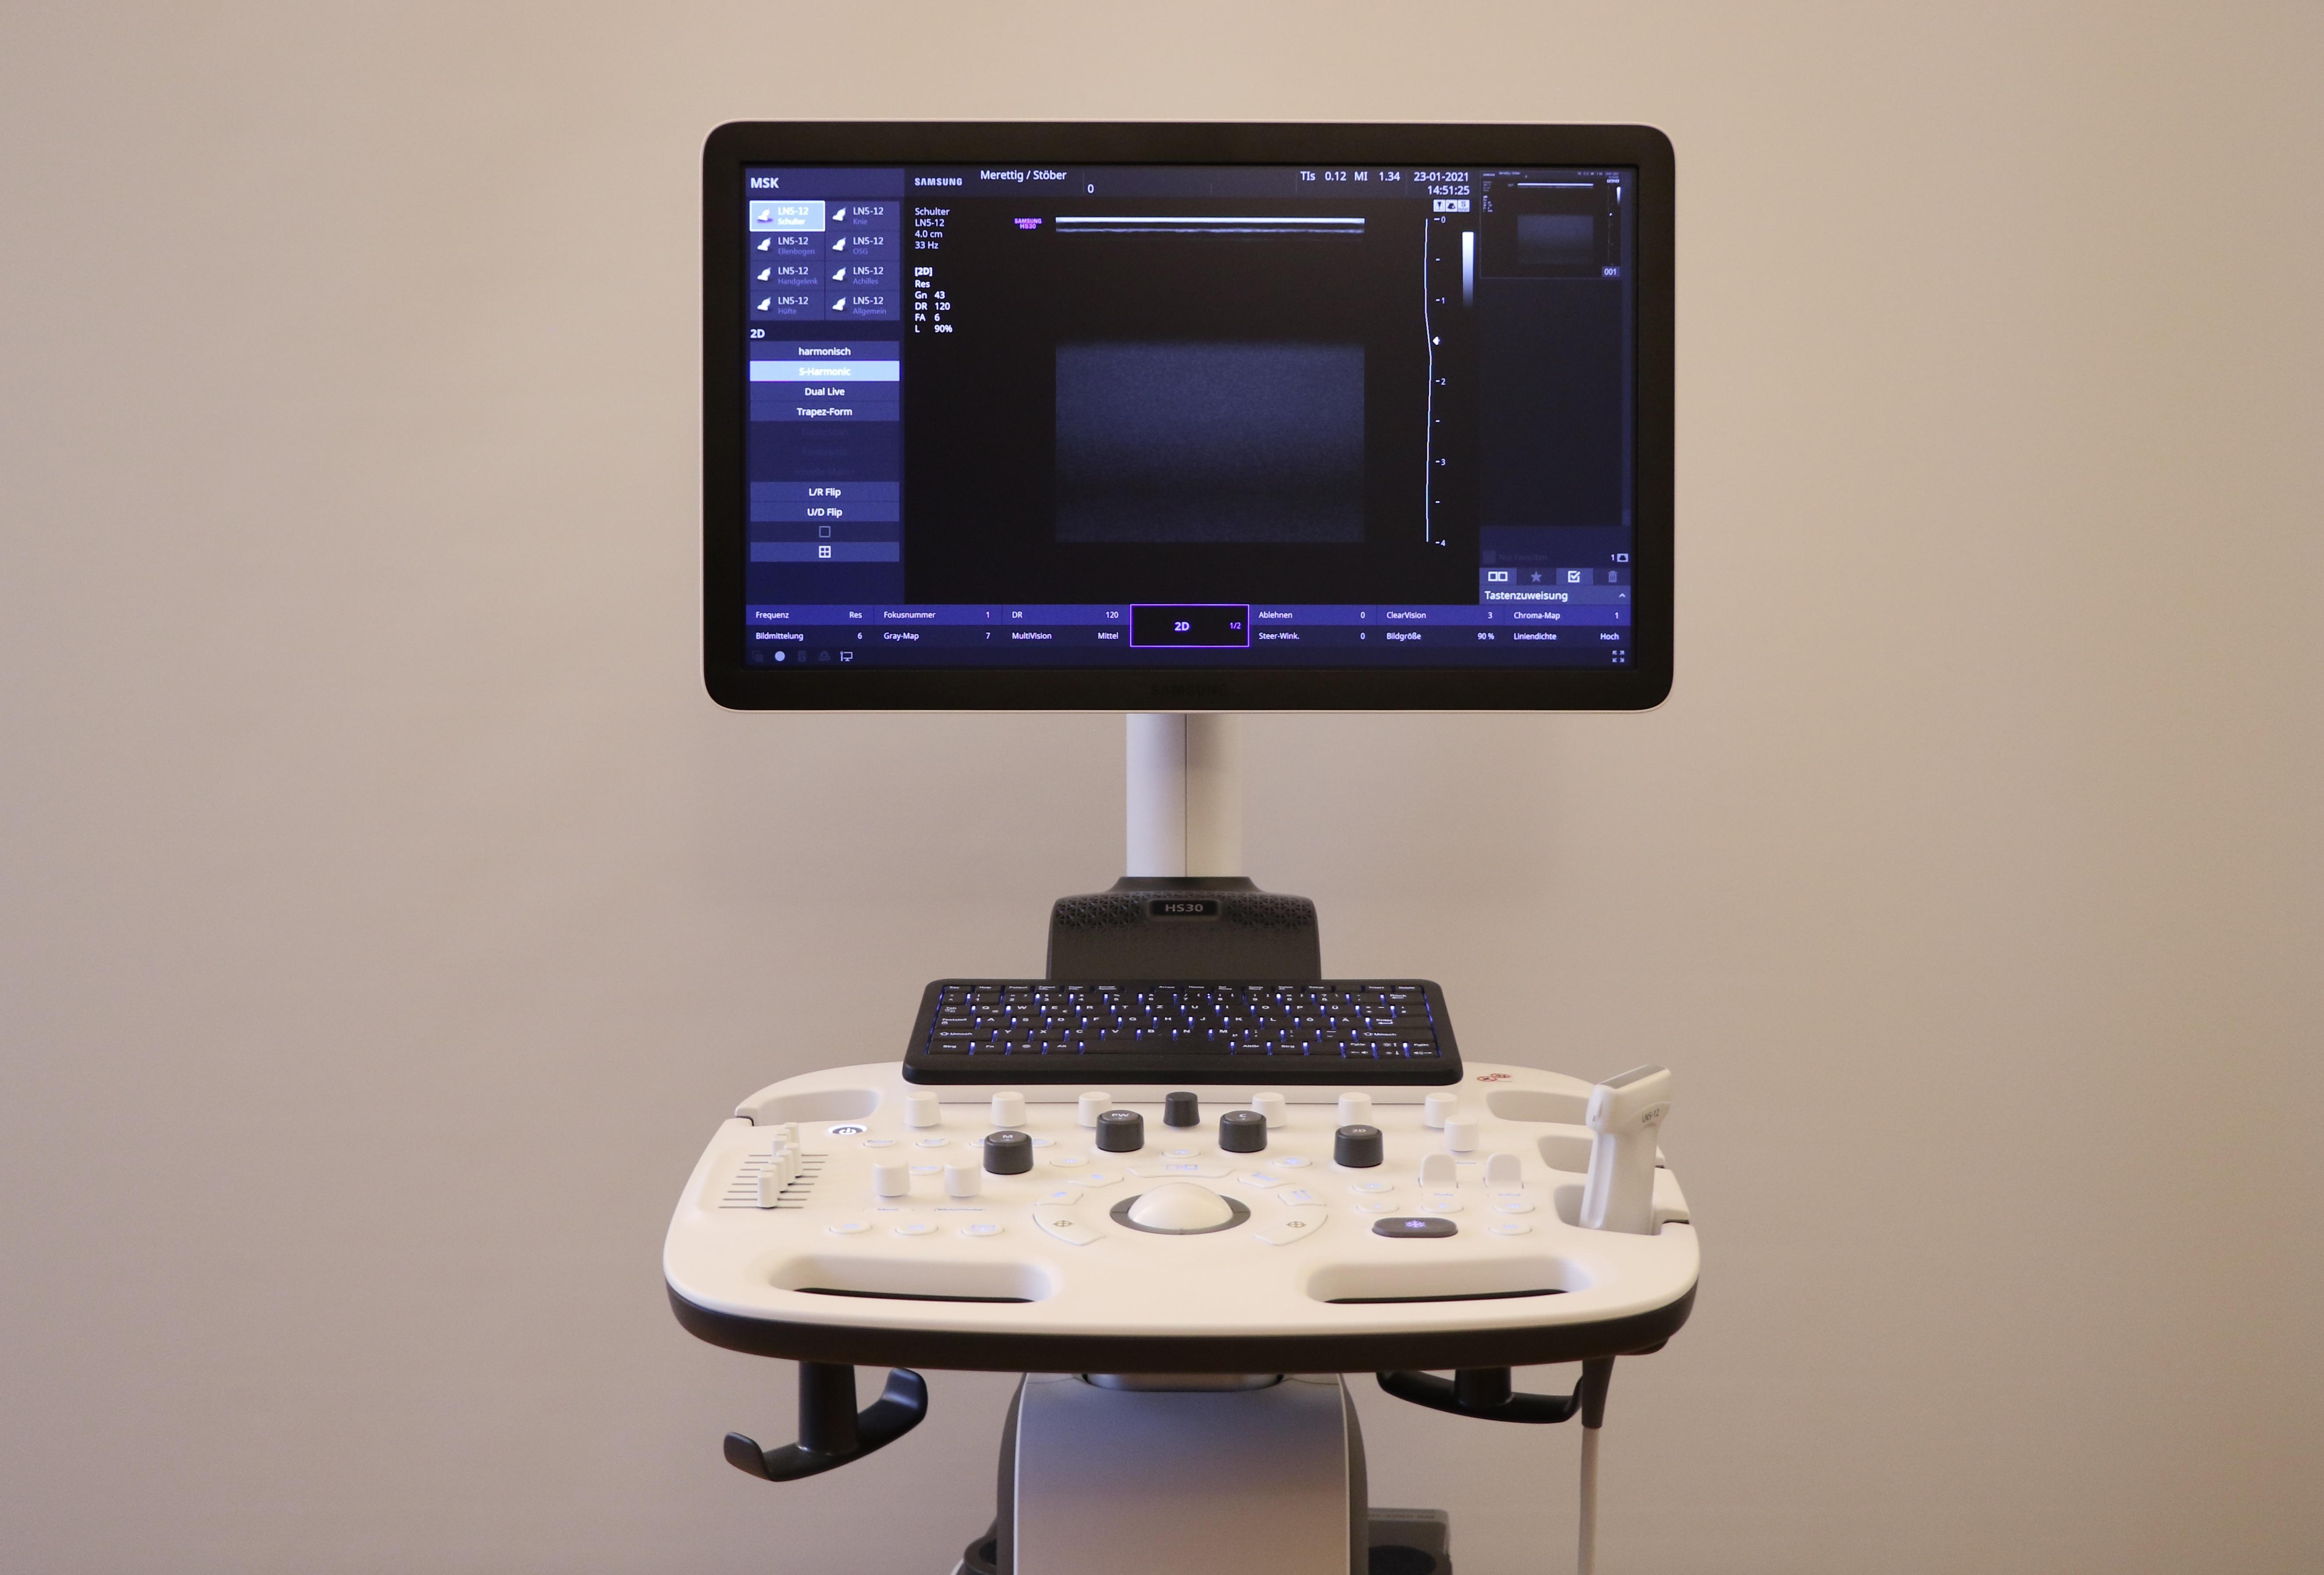 Sonografiegerät